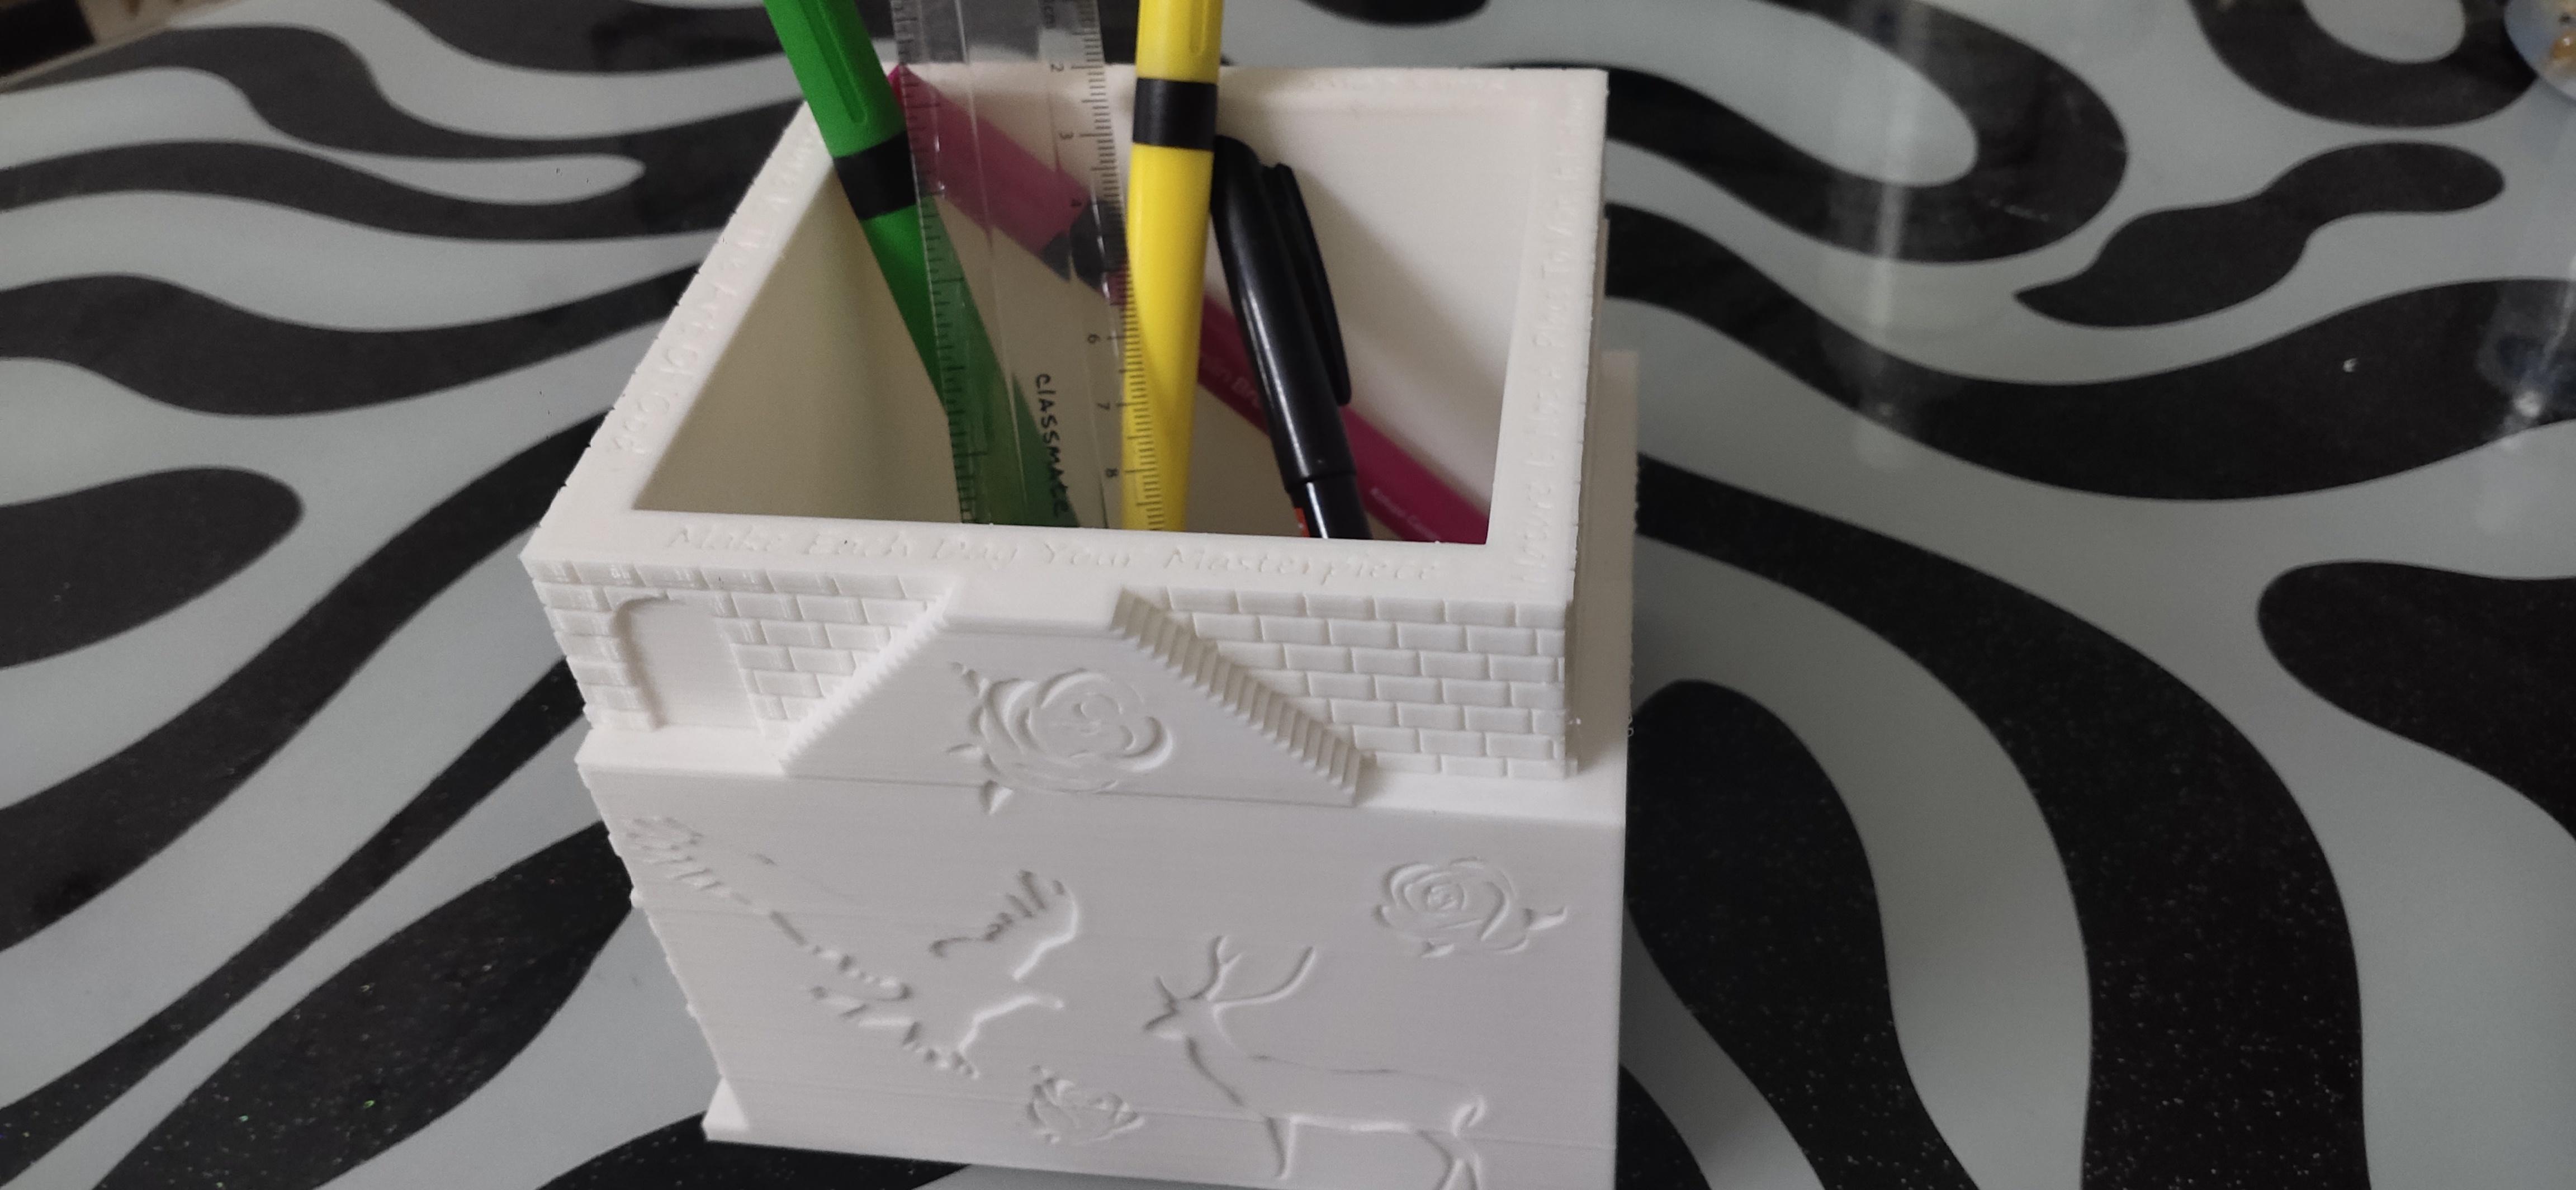 IMG_20200928_160139.jpg Download STL file Plant and desk pot • 3D printer object, FutureDesigns